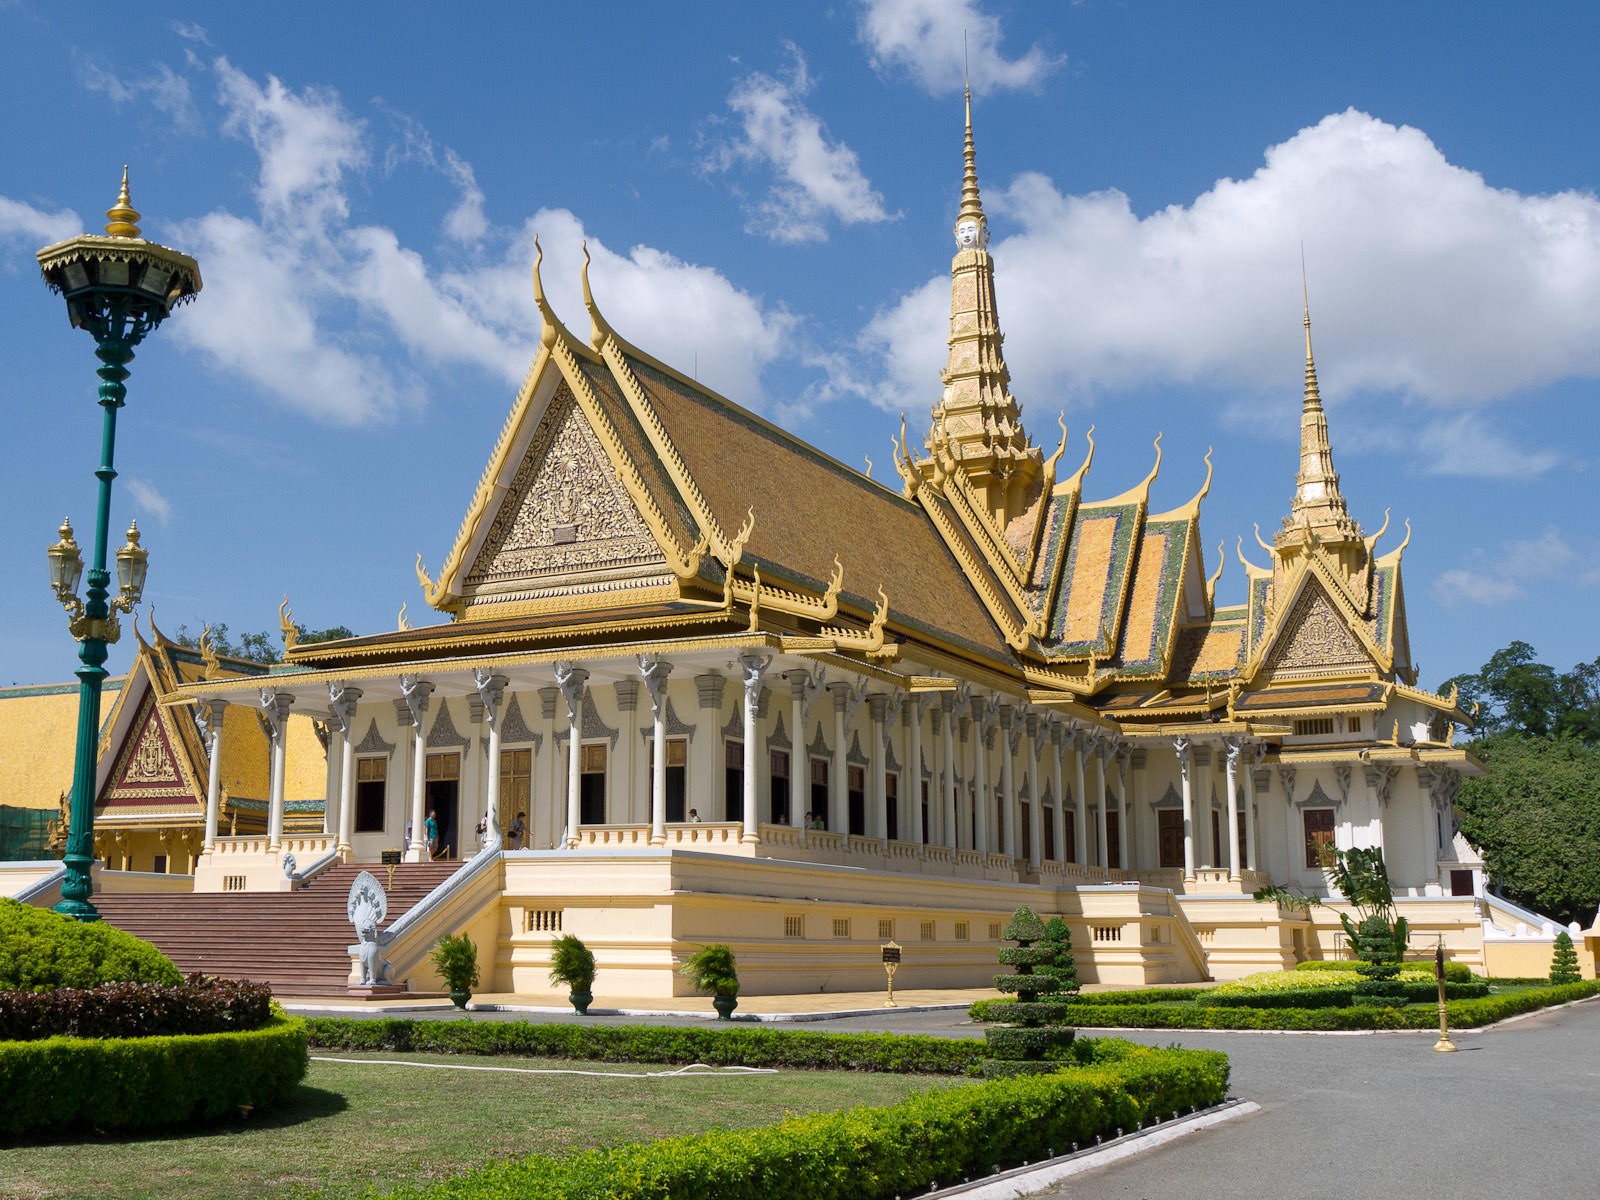 Royal Palace building